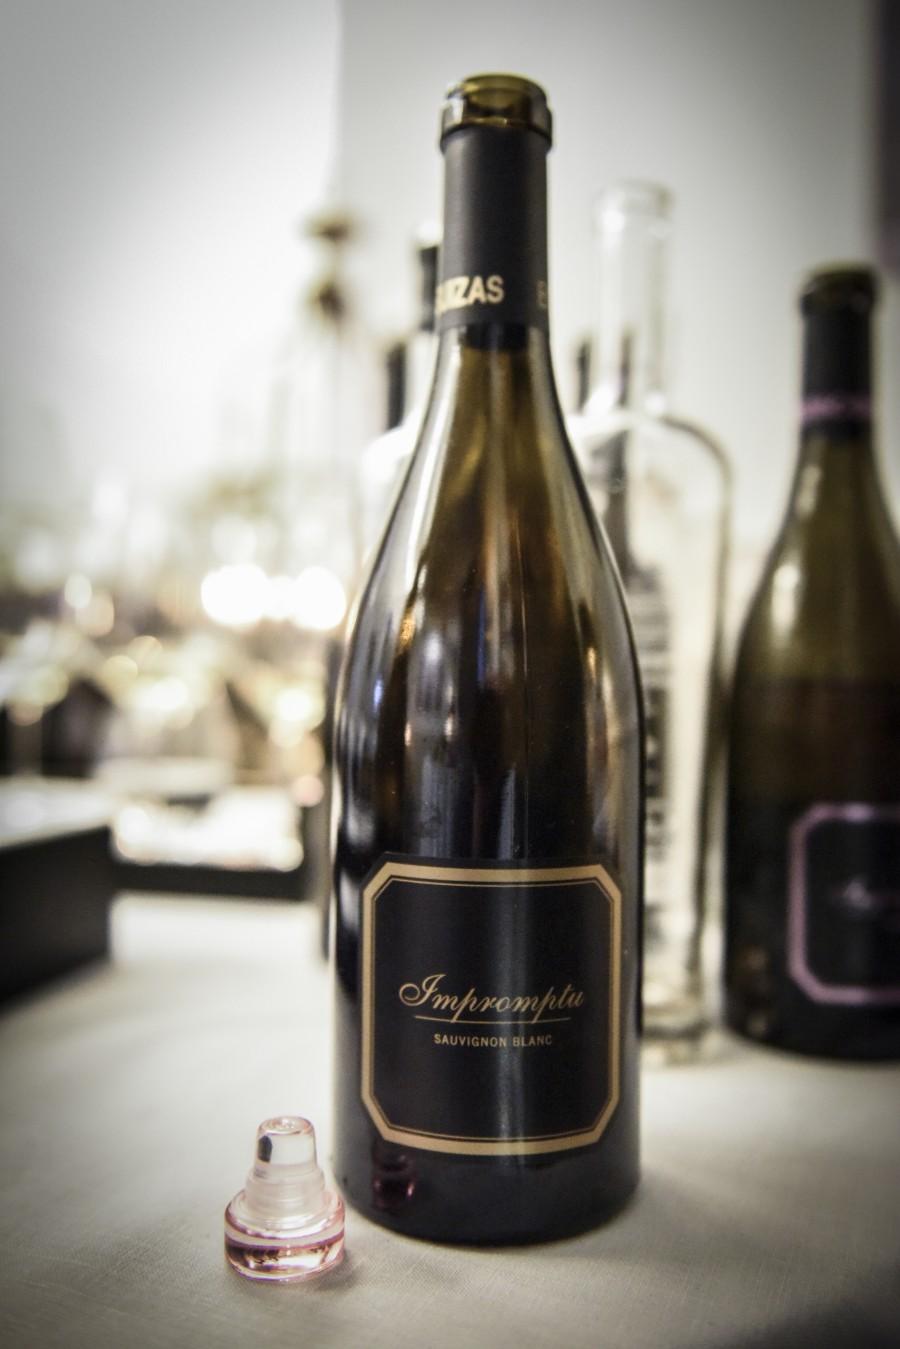 Impromptu Sauvignon Blanc D.O. Utiel-Requena